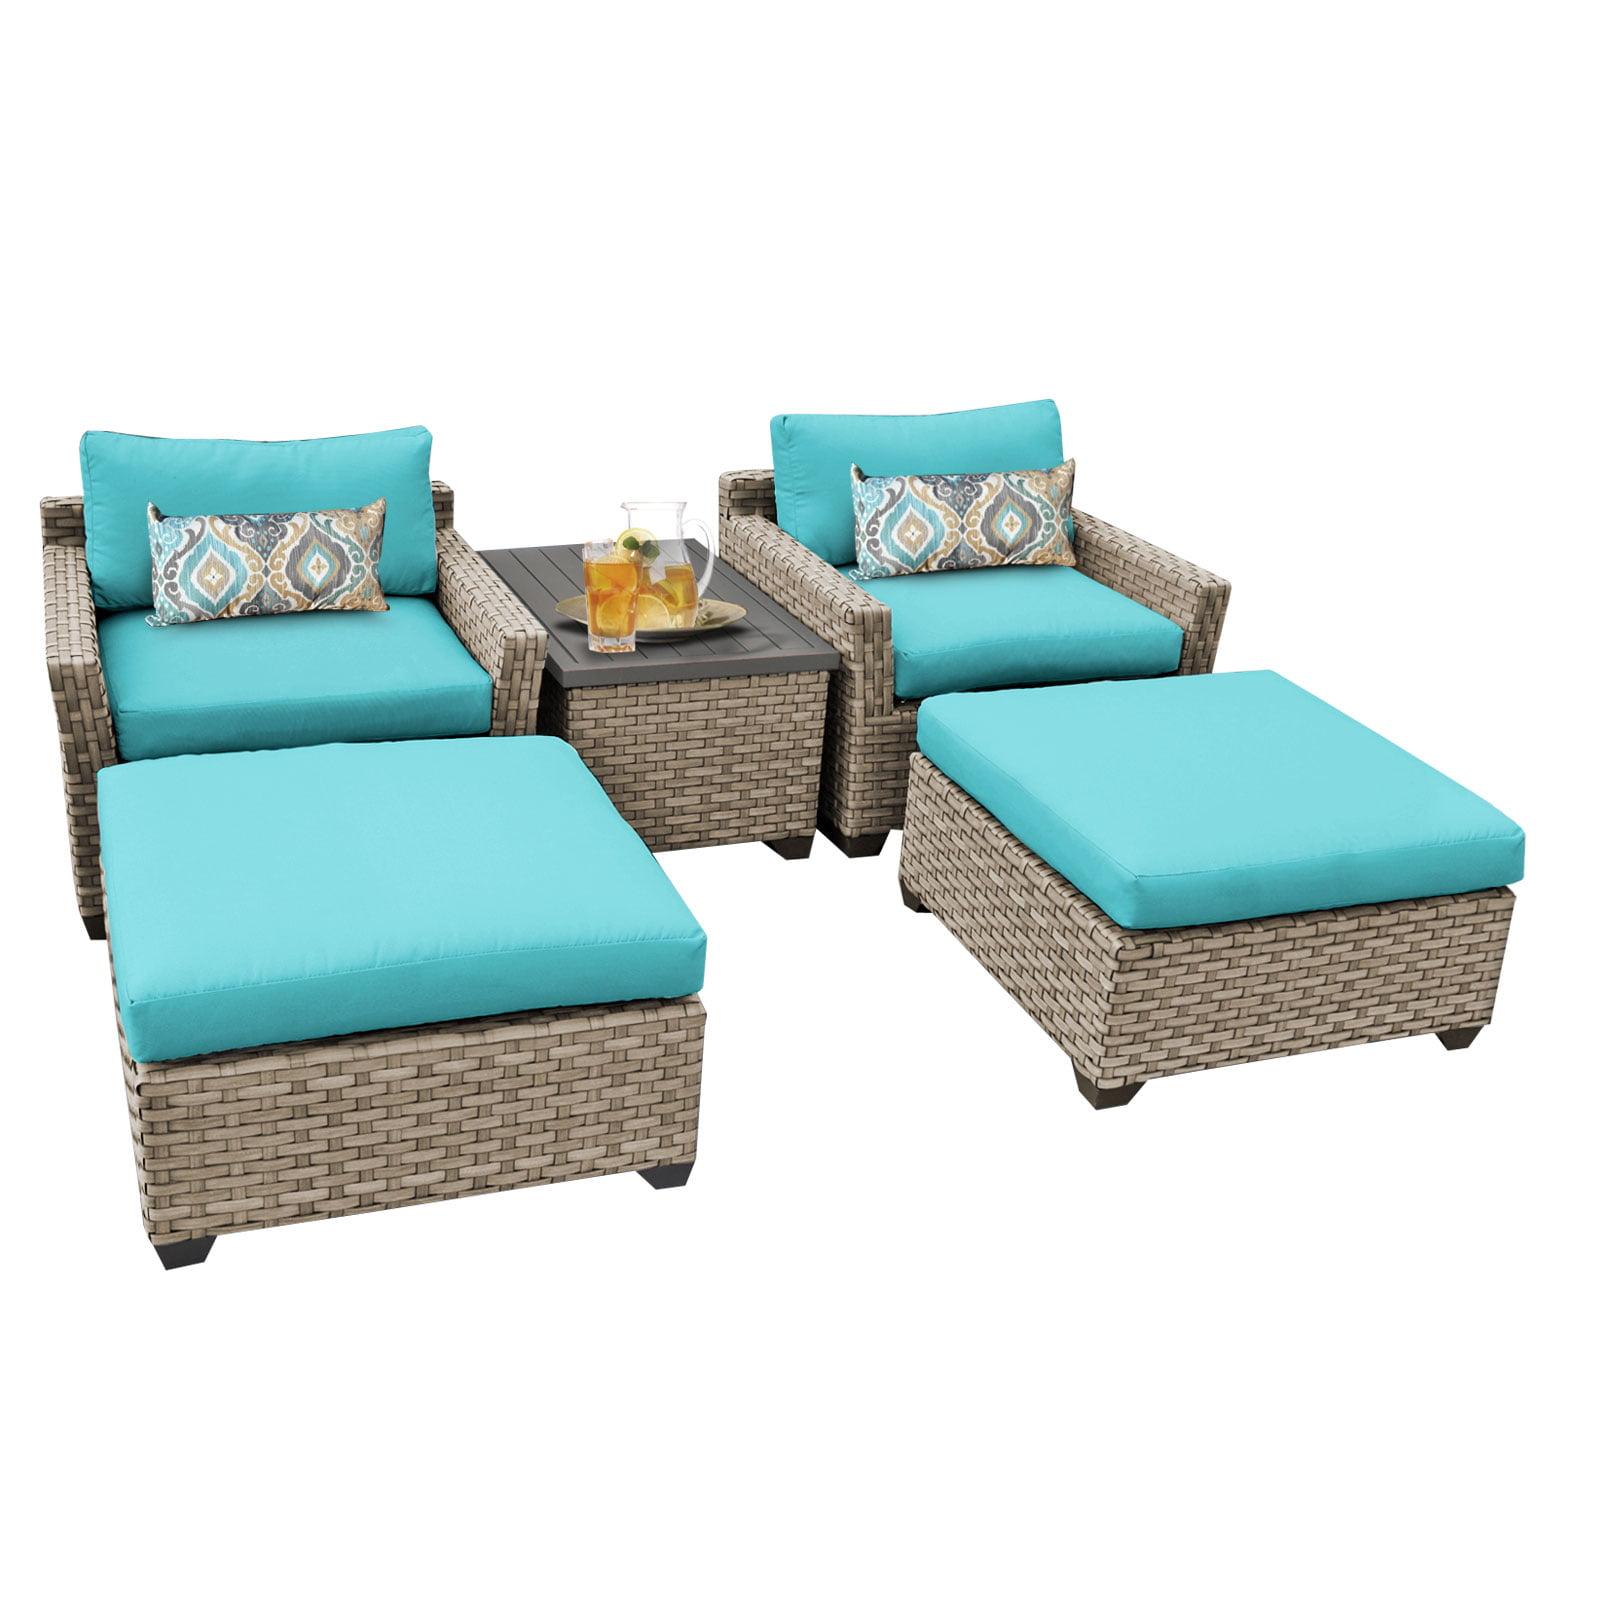 Hampton 5 Piece Outdoor Wicker Patio Furniture Set 05a